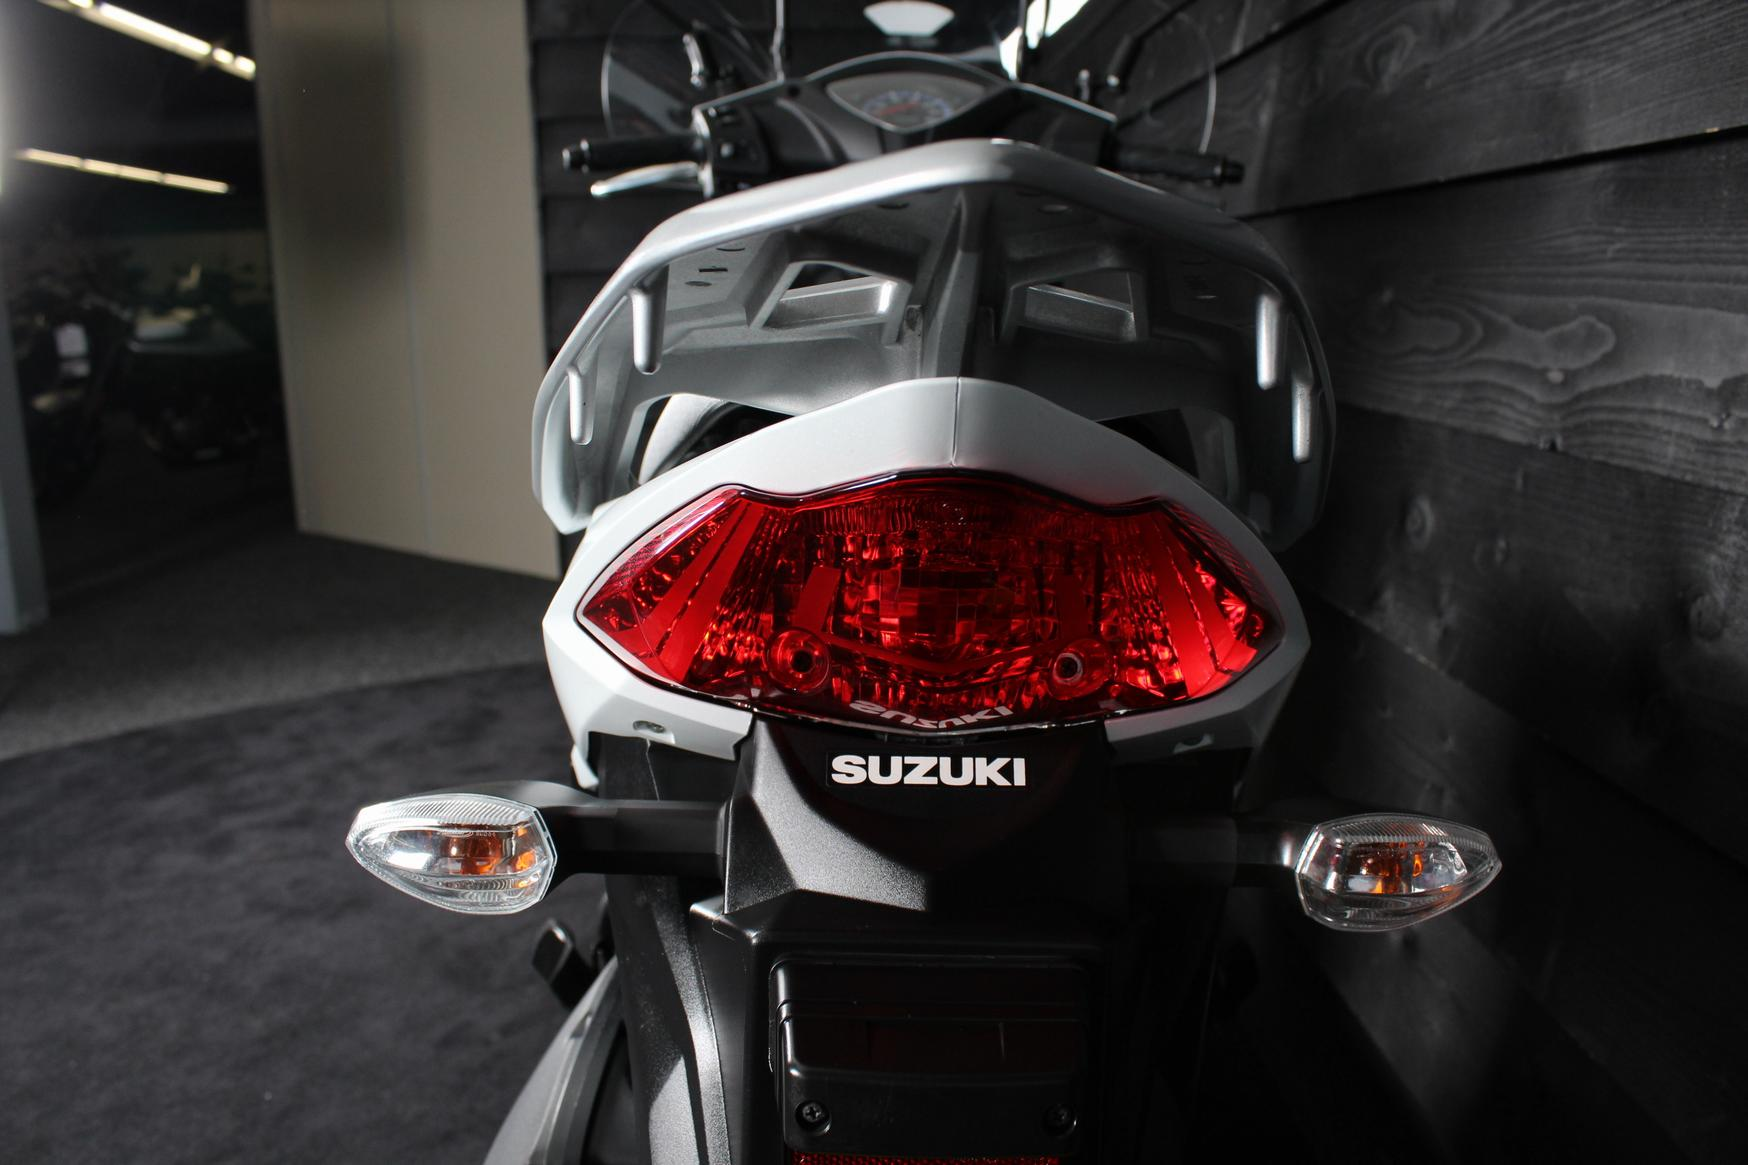 SUZUKI - Address 110